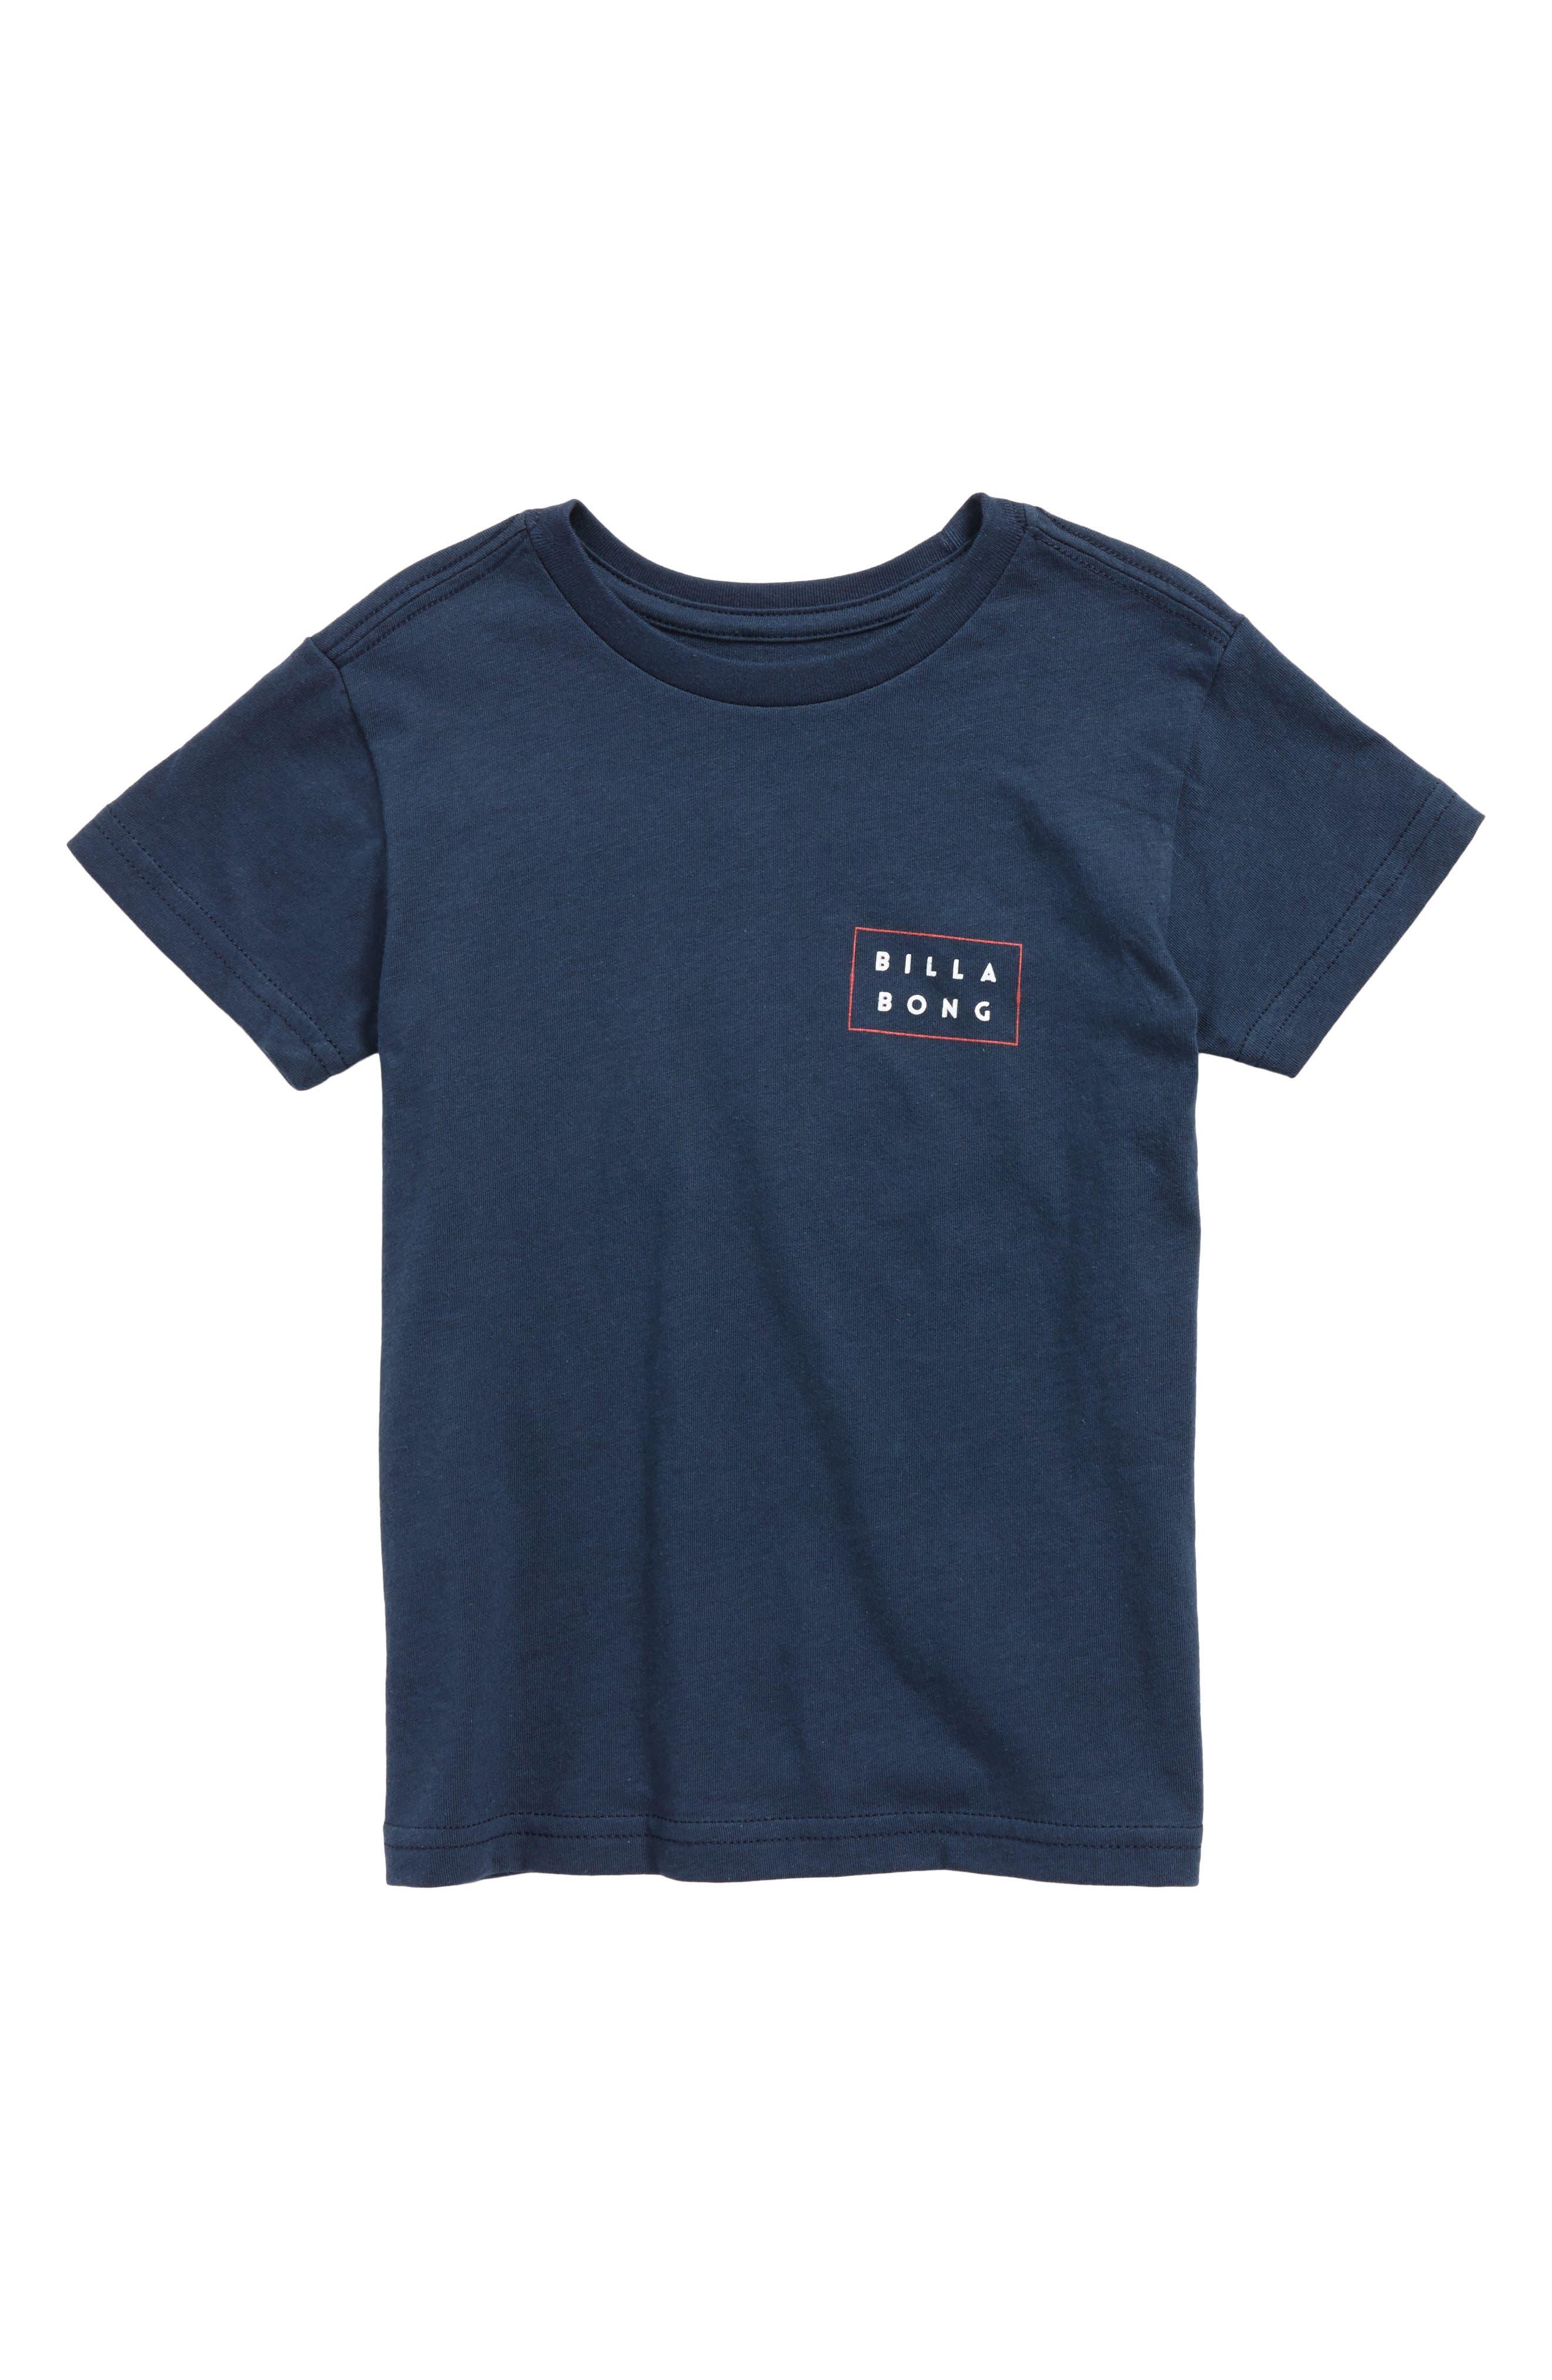 Fill Die Cut T-Shirt,                             Main thumbnail 1, color,                             Navy